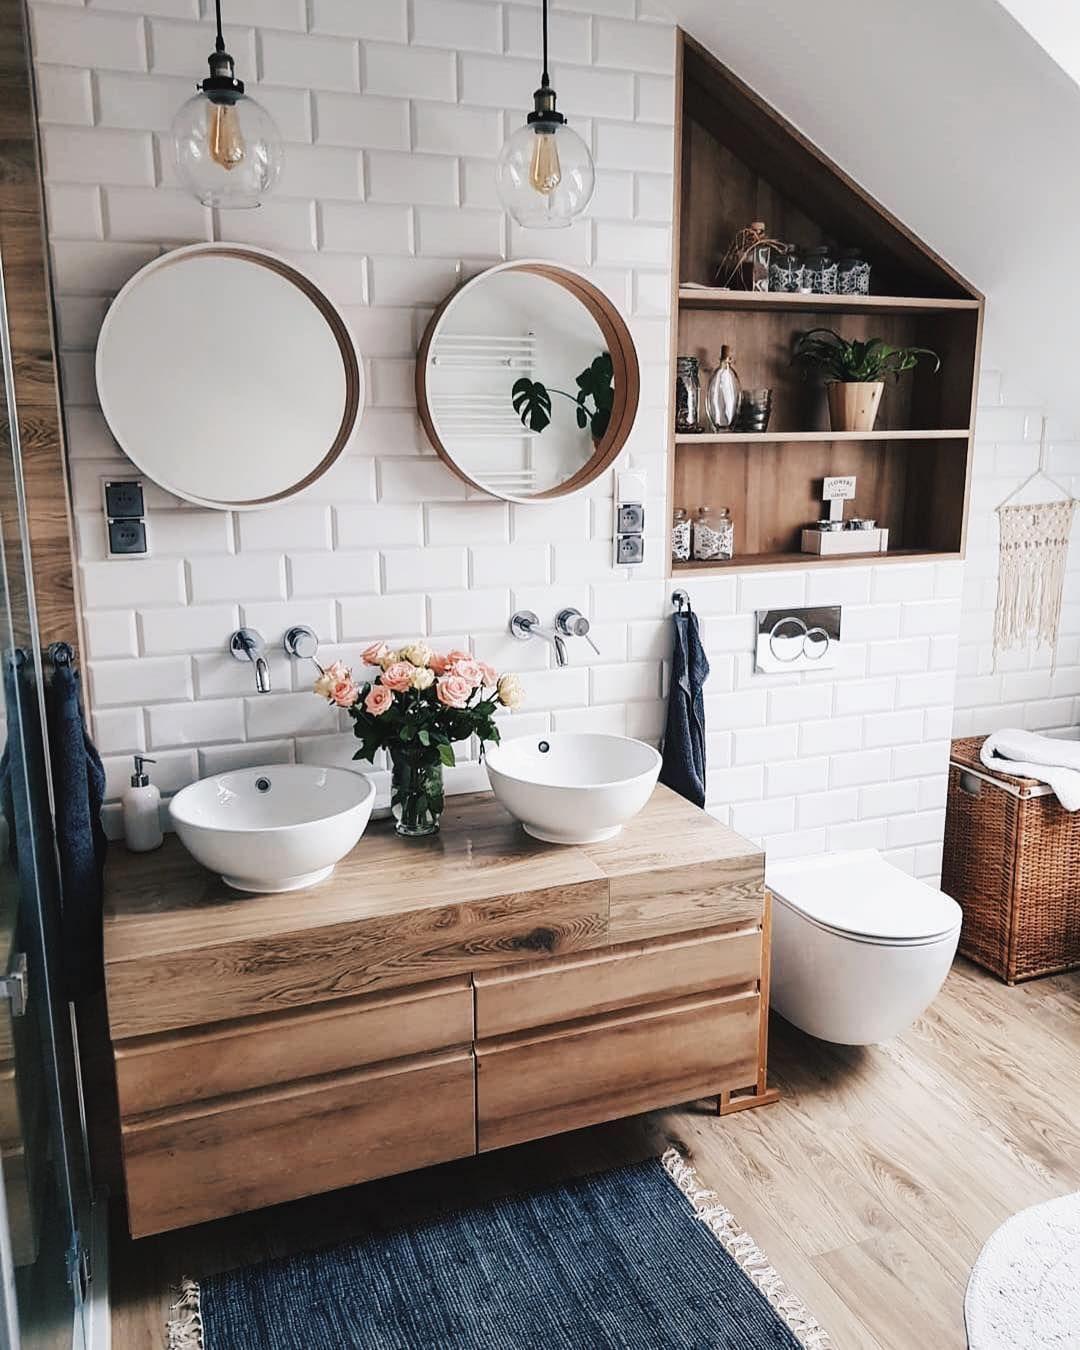 56 Bathroom Set Ideas Your Home Design Hotels Neat Fast Master Bath Renovation Modern Farmhouse Bathroom Bathroom Inspiration